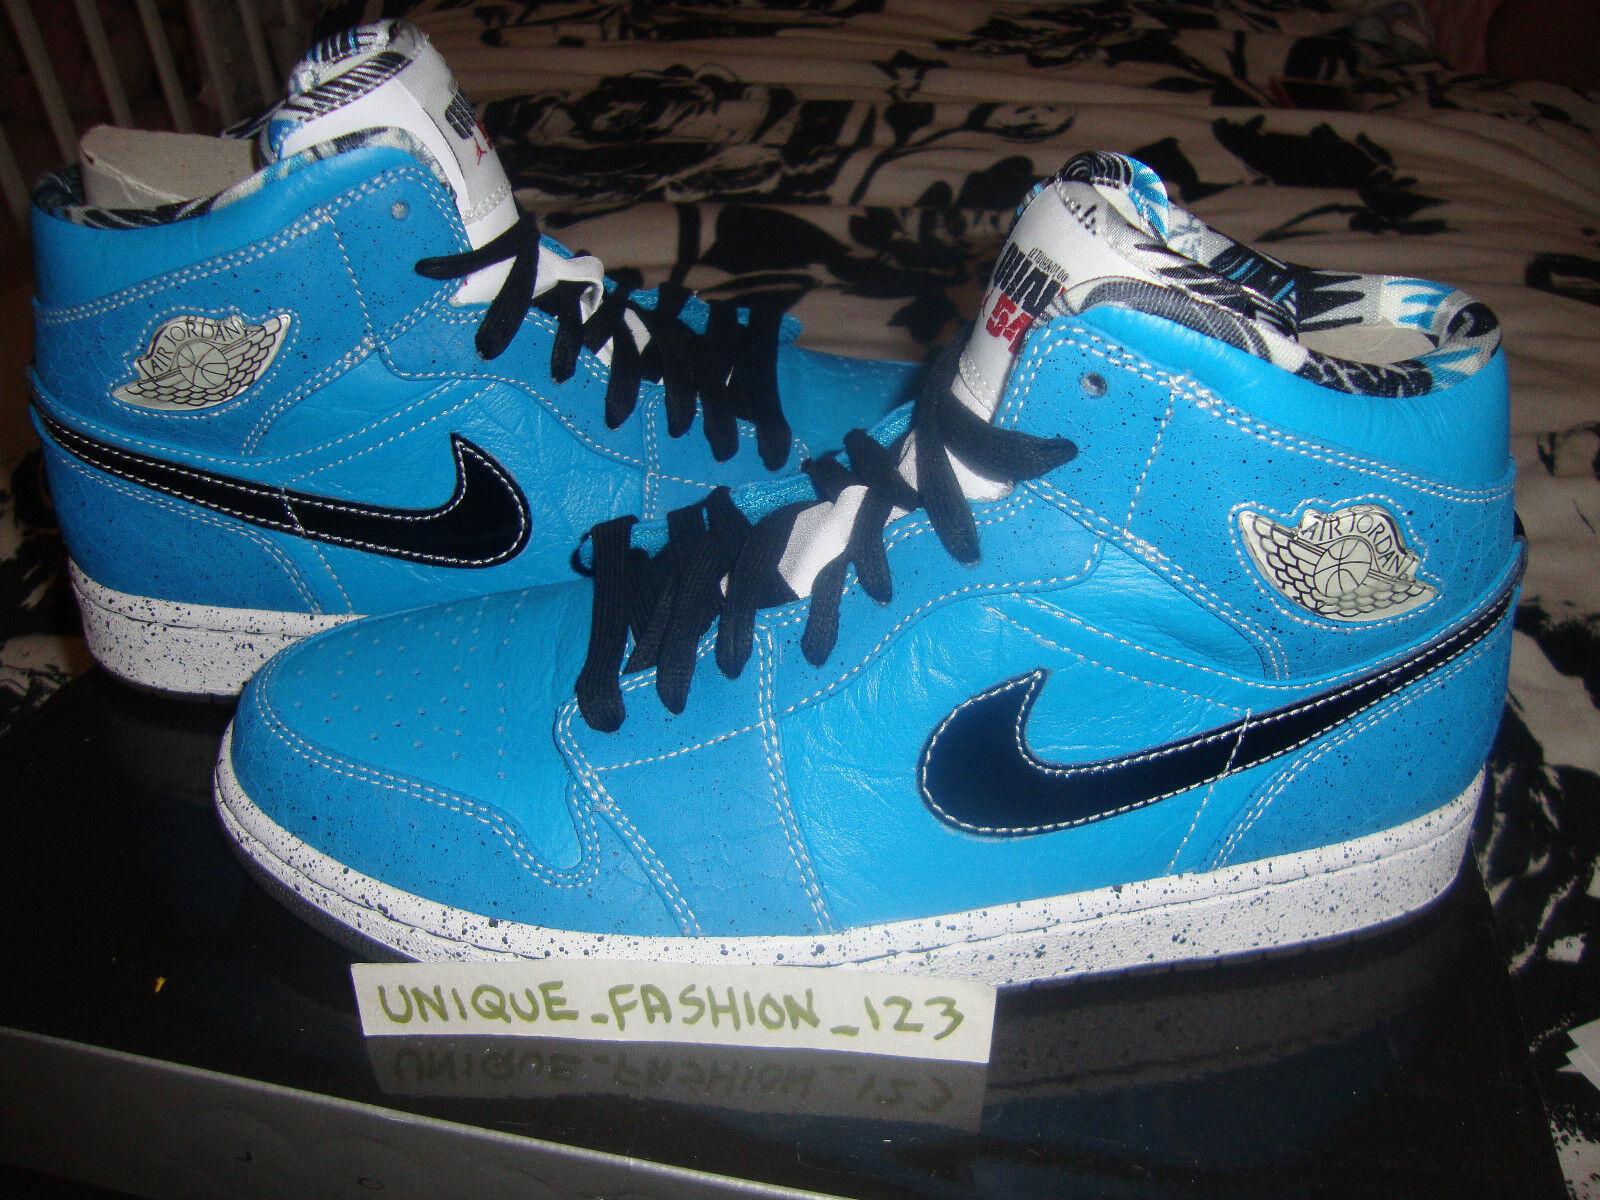 Nike air jordan retrò alto quai 54 bruta n tuff noi 9 allevati blu reale